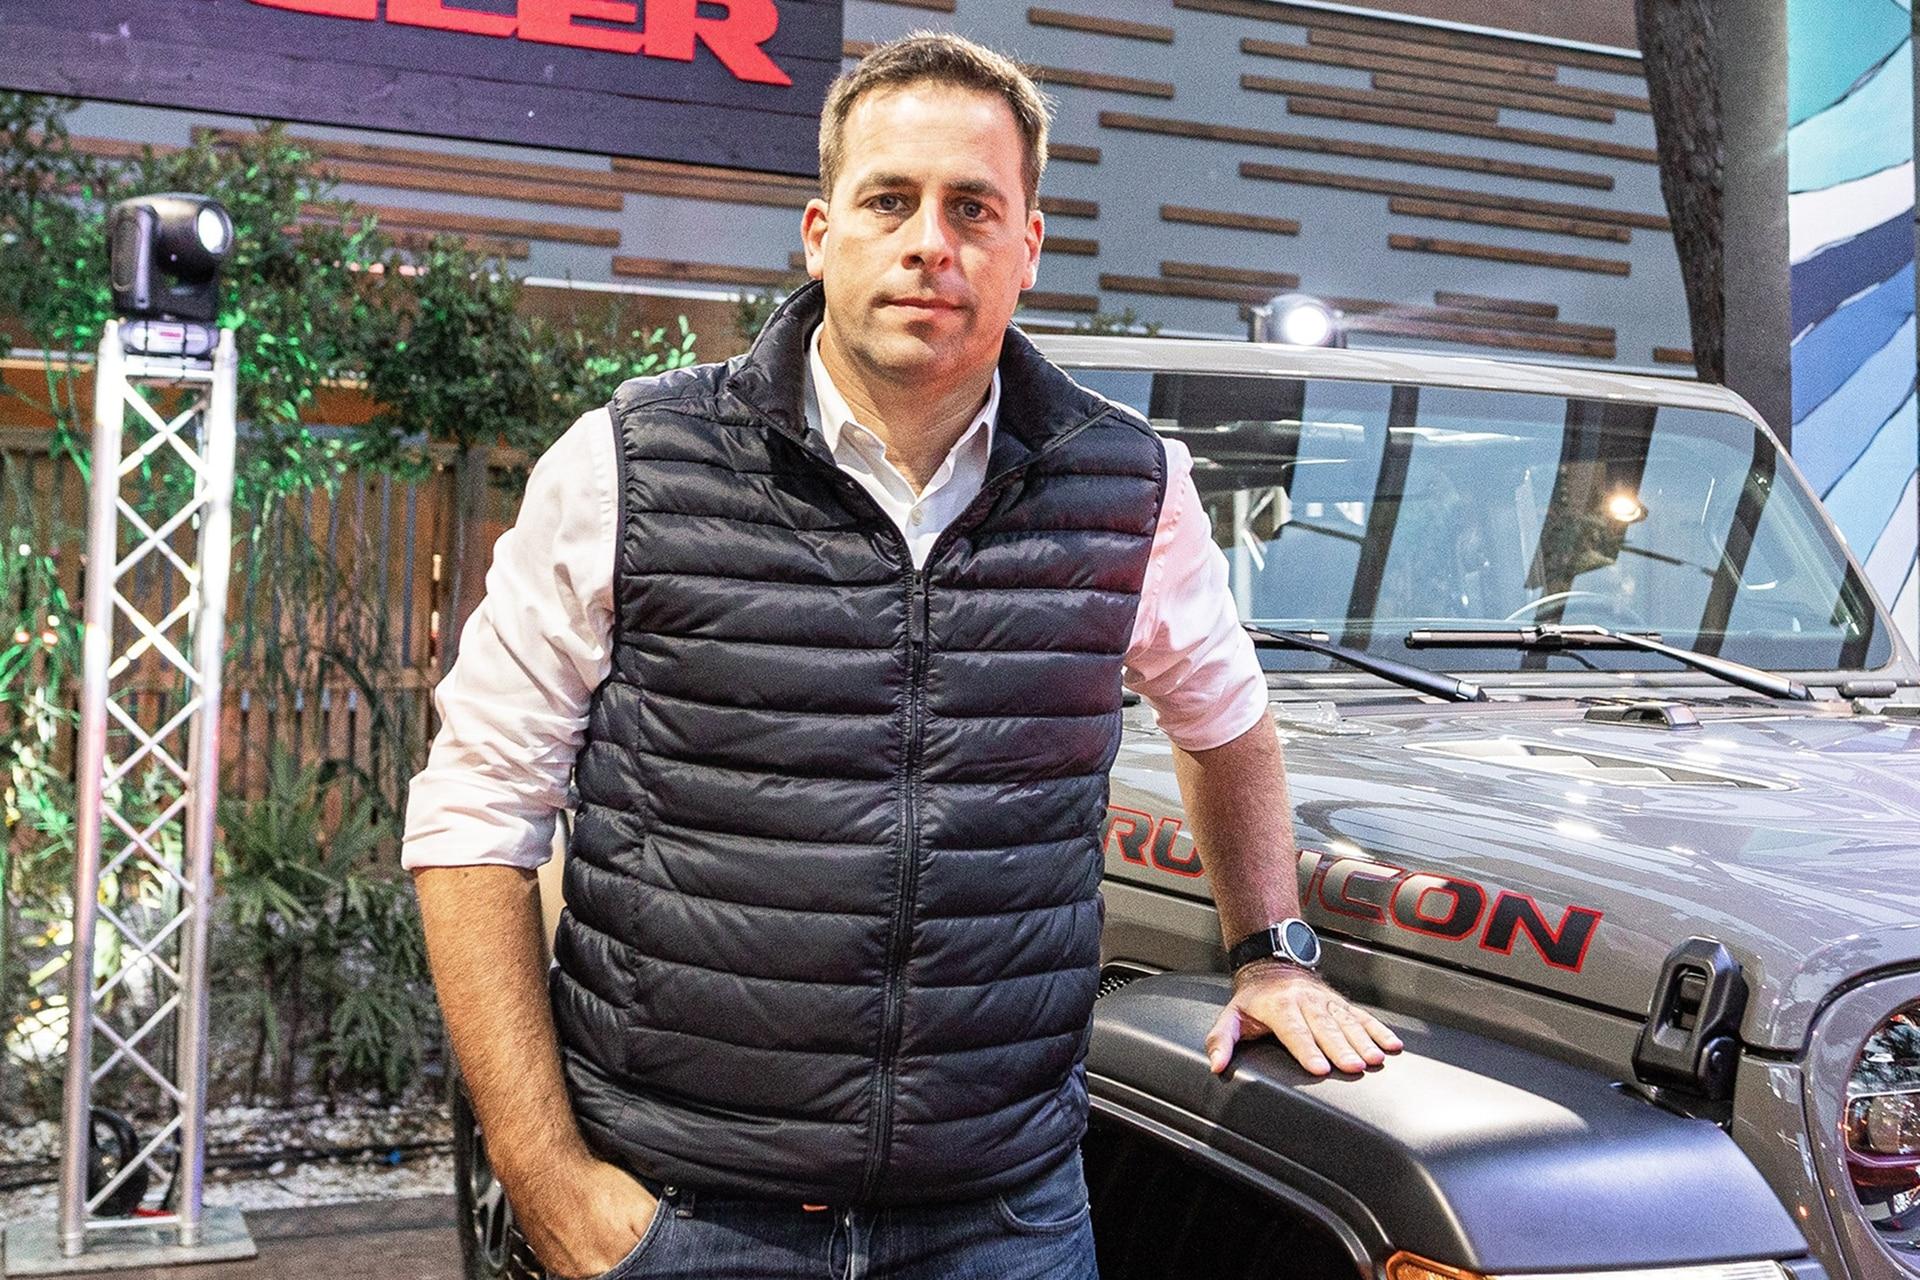 Martín Zuppi, director general de Fiat Chrysler Automobiles